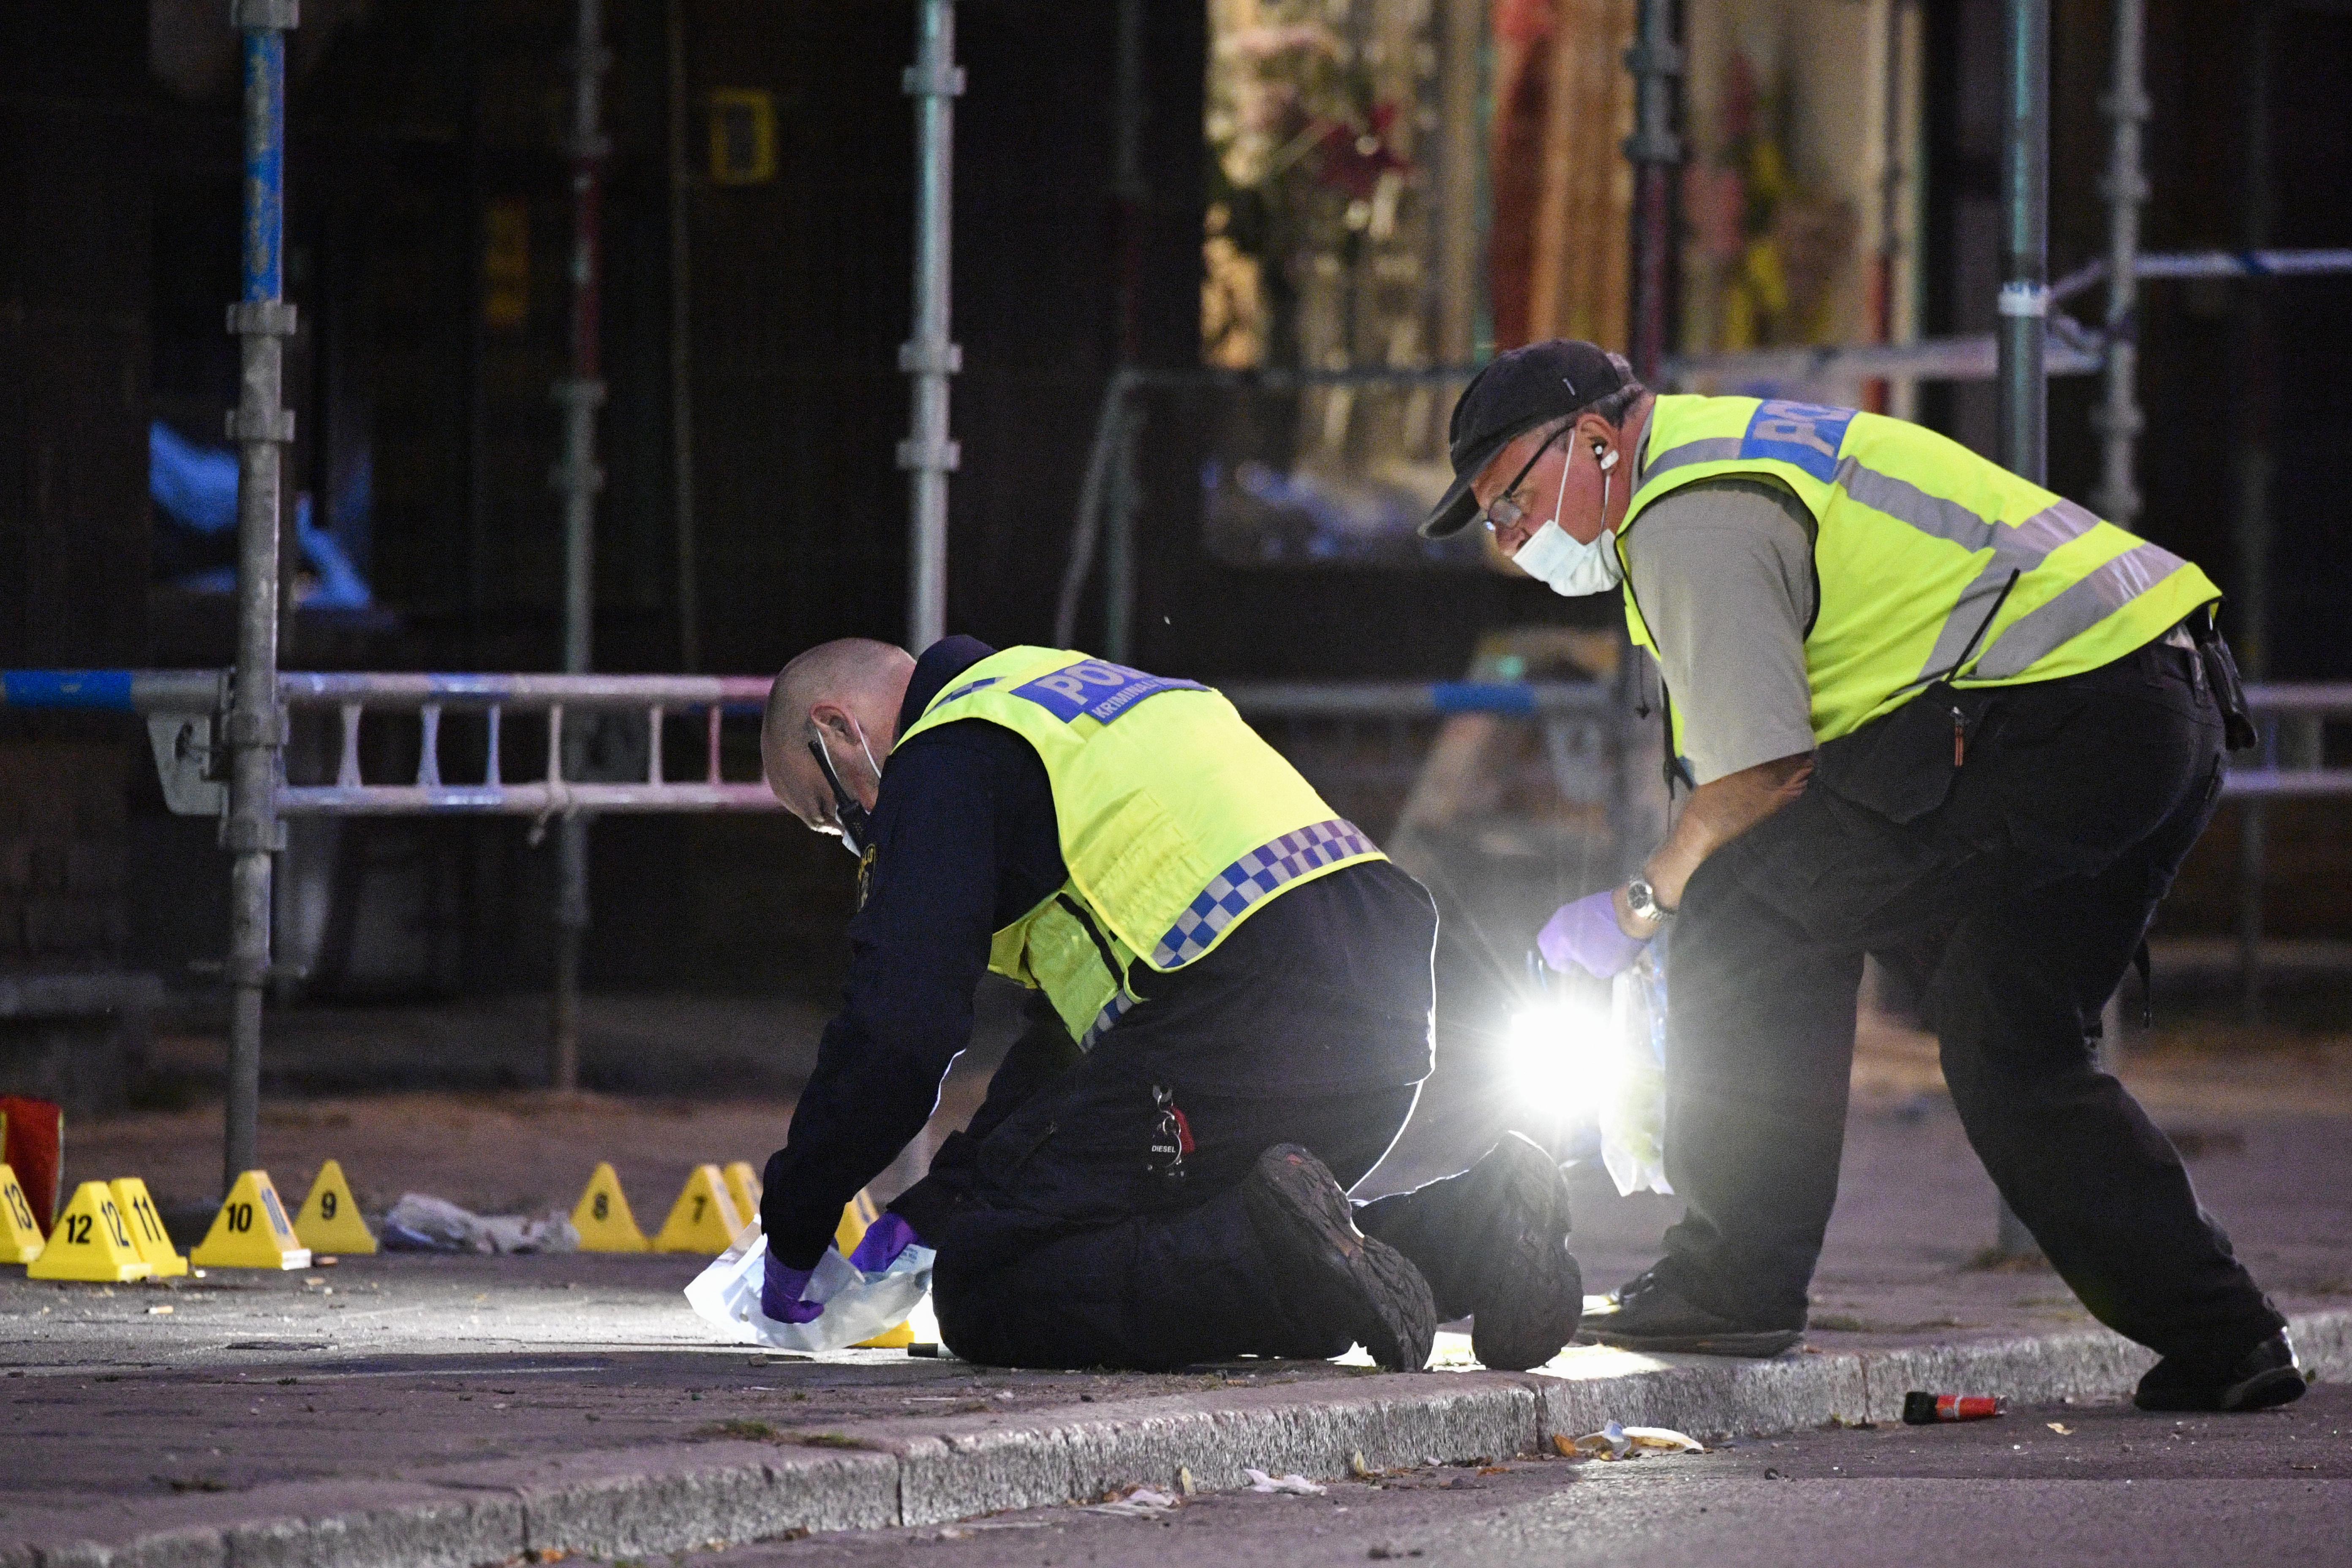 Svezia, sparatoria in centro a Malmoe